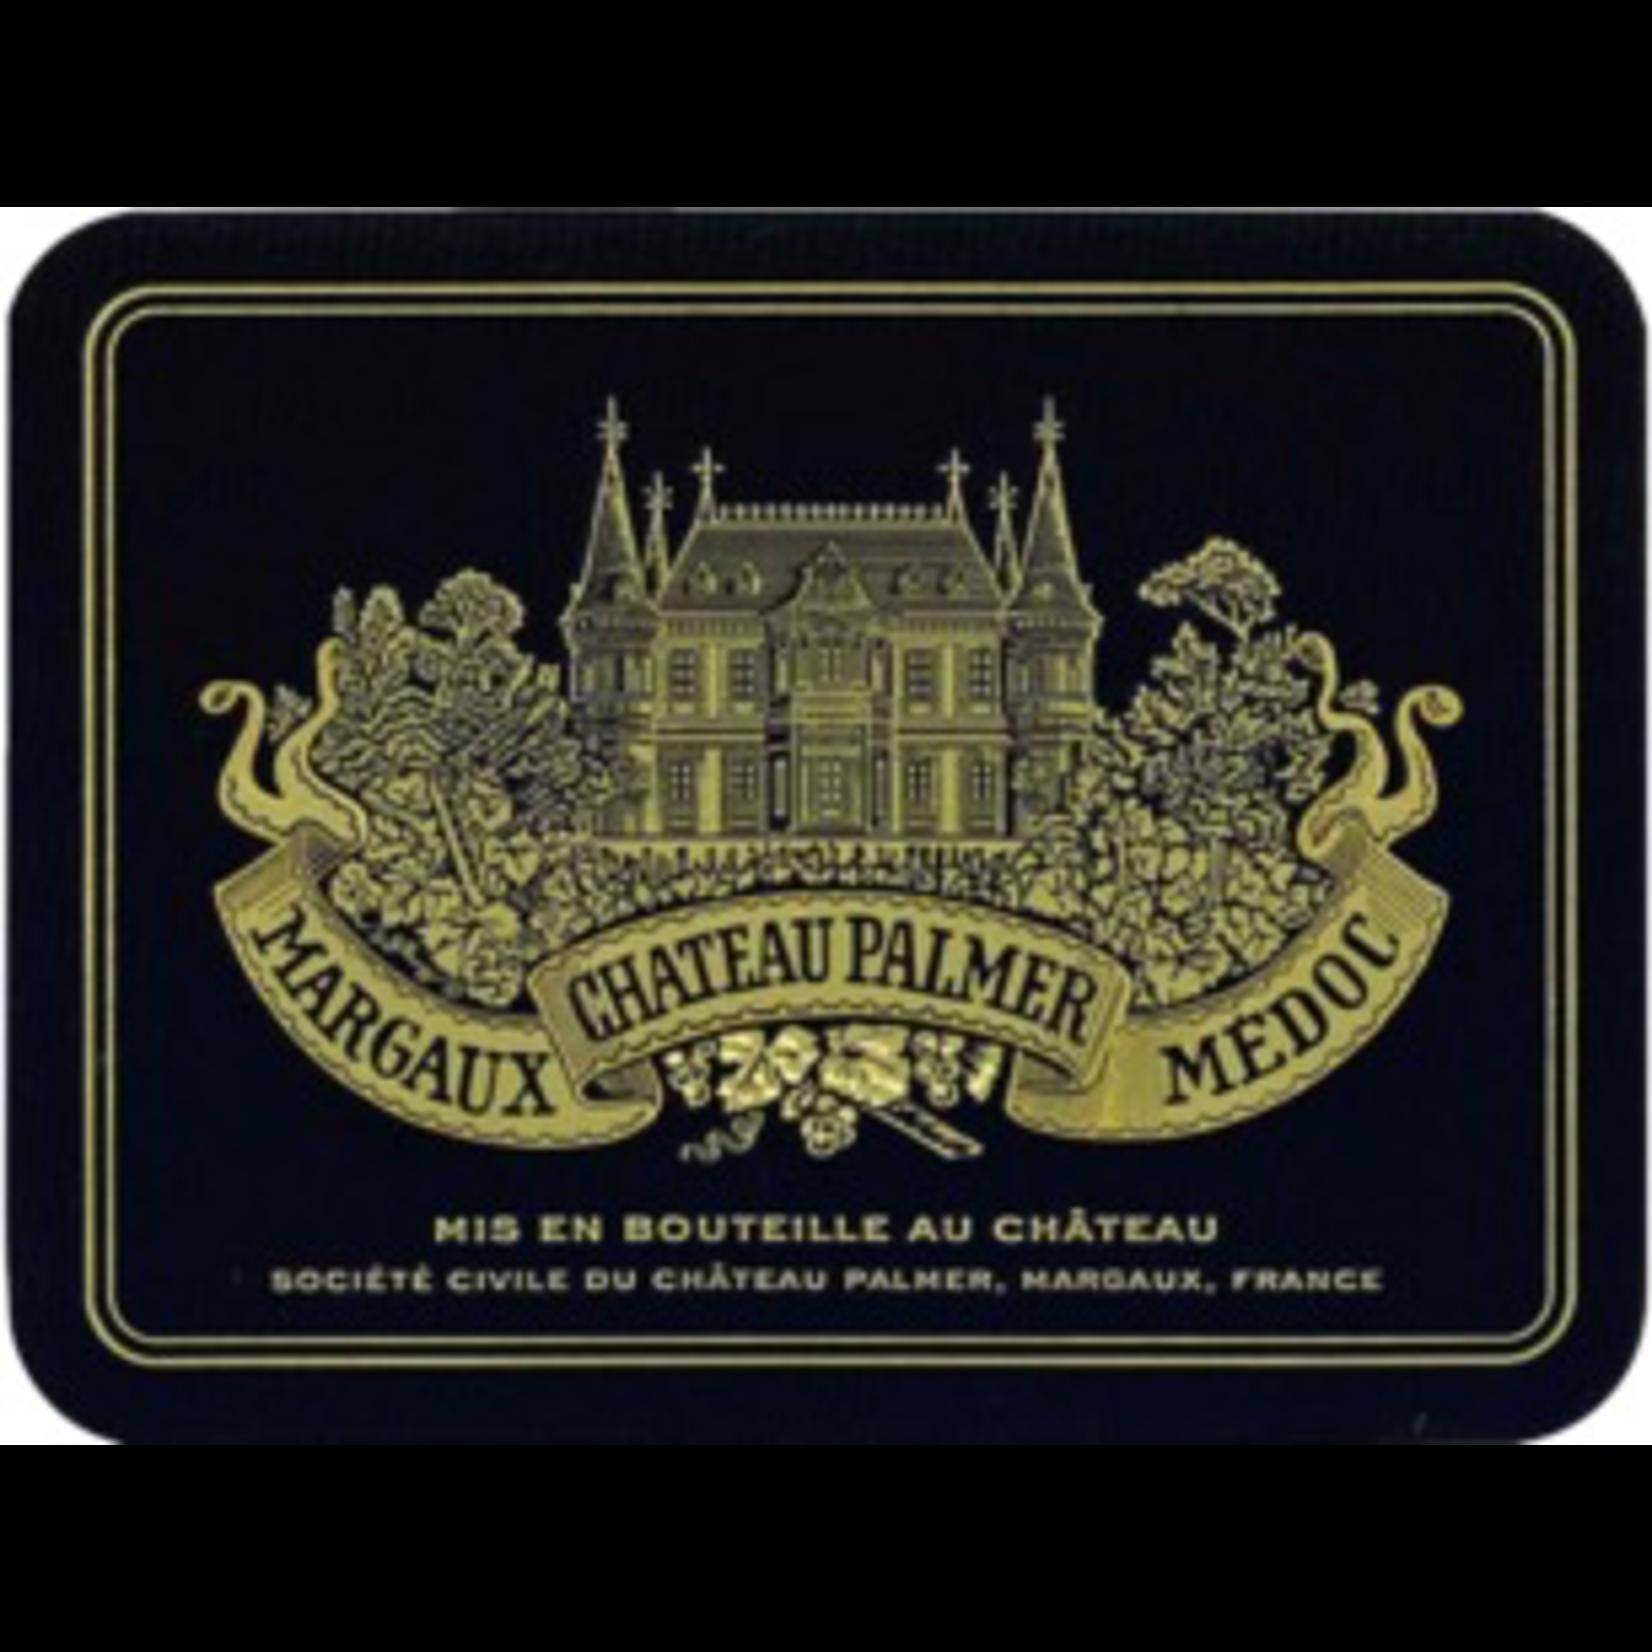 Wine Chateau Palmer 2014